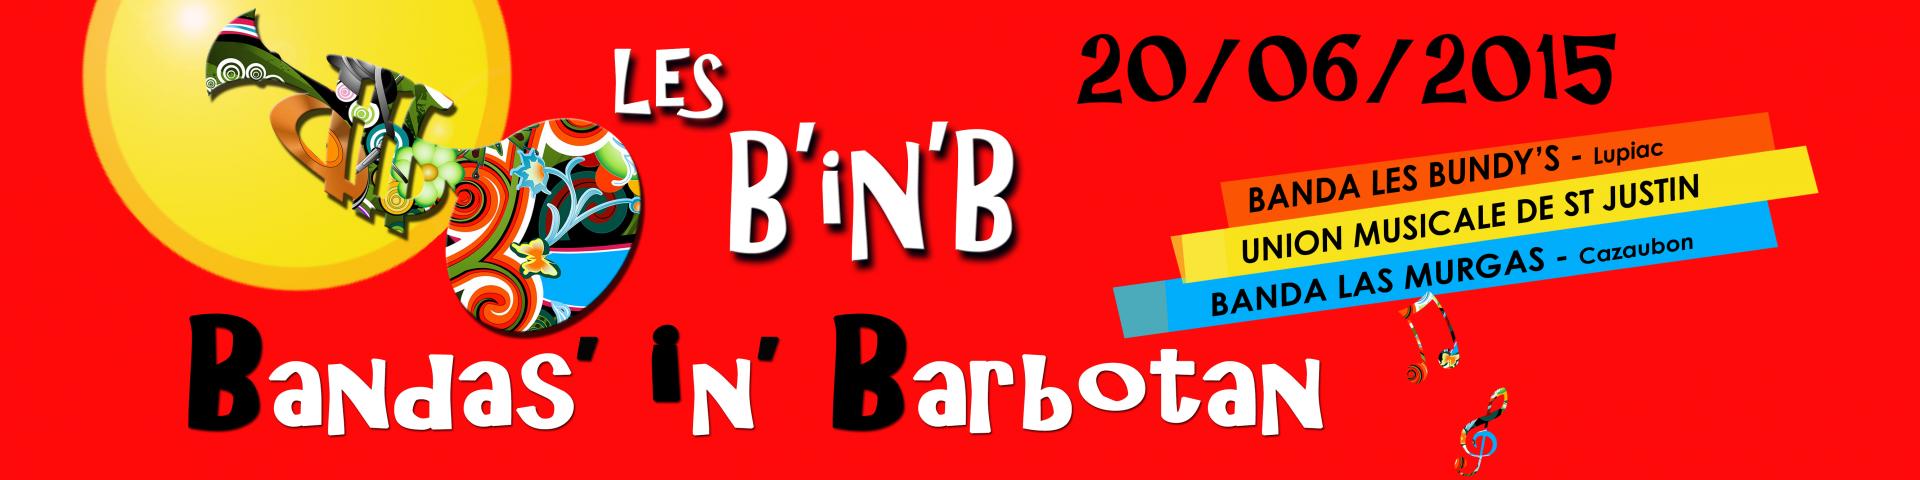 bnb-353